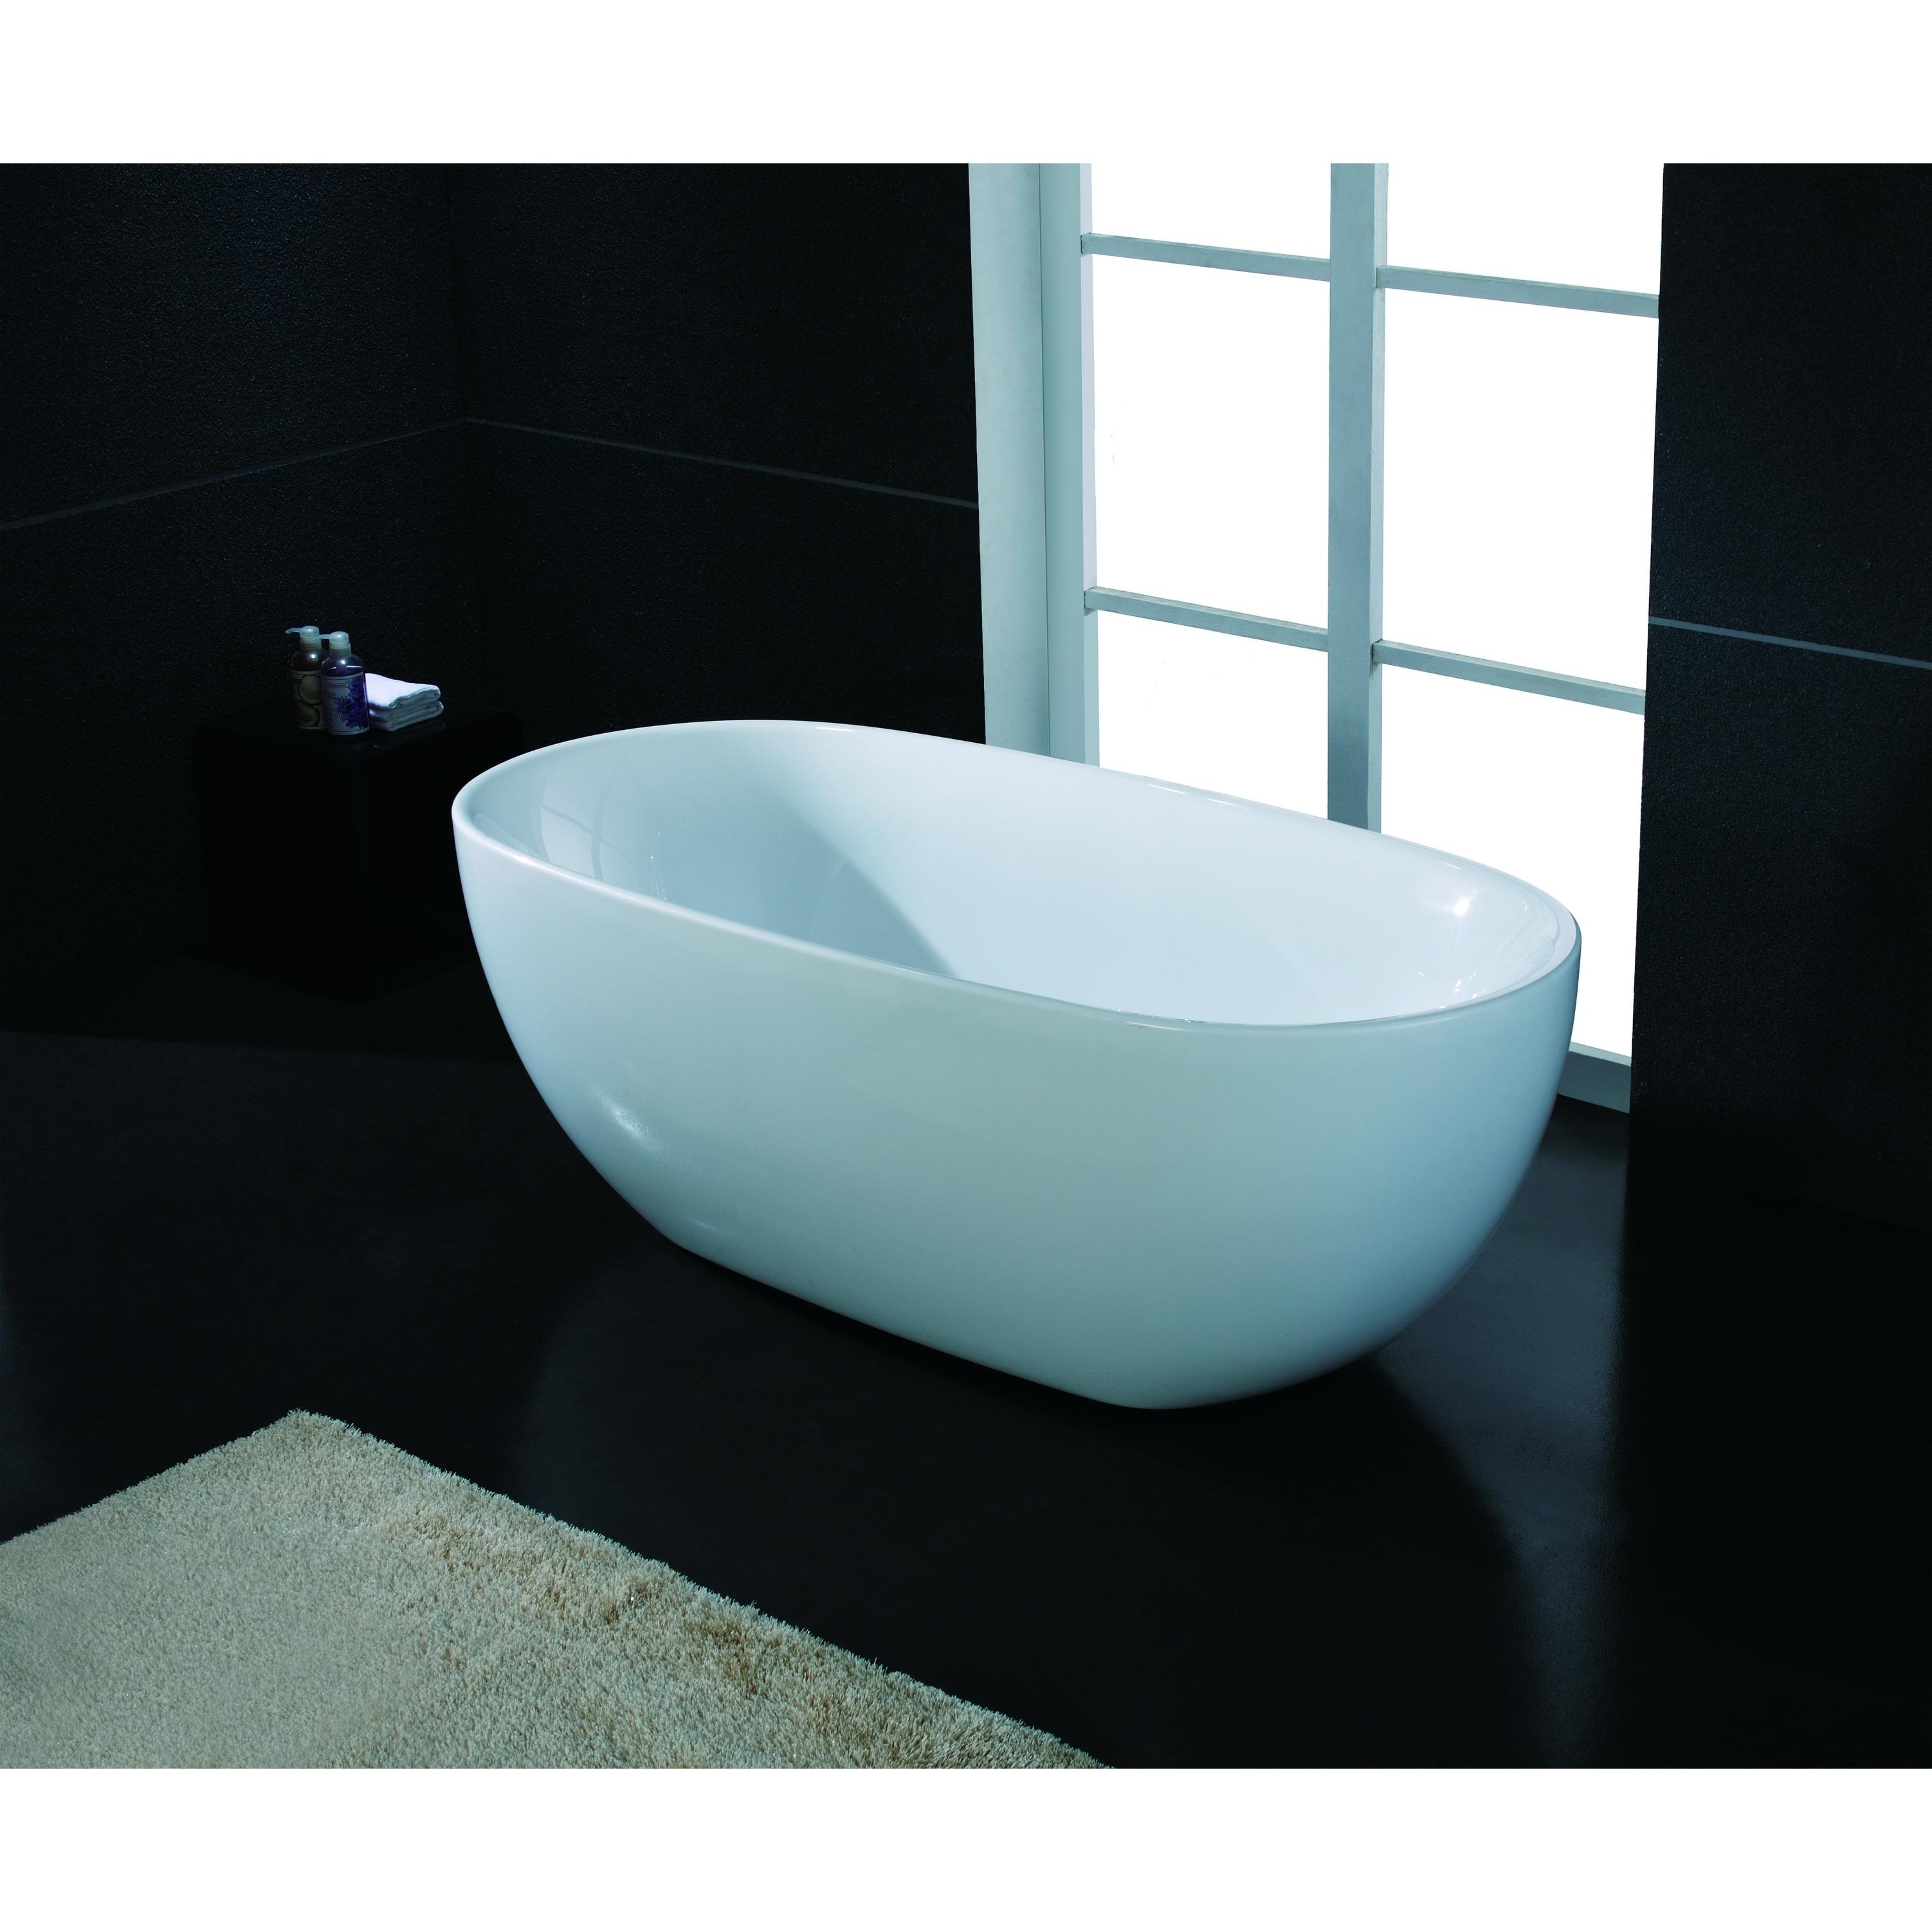 AKDY Bathroom 67 Spa White Color Free Standing Acrylic Soaking Bathtub